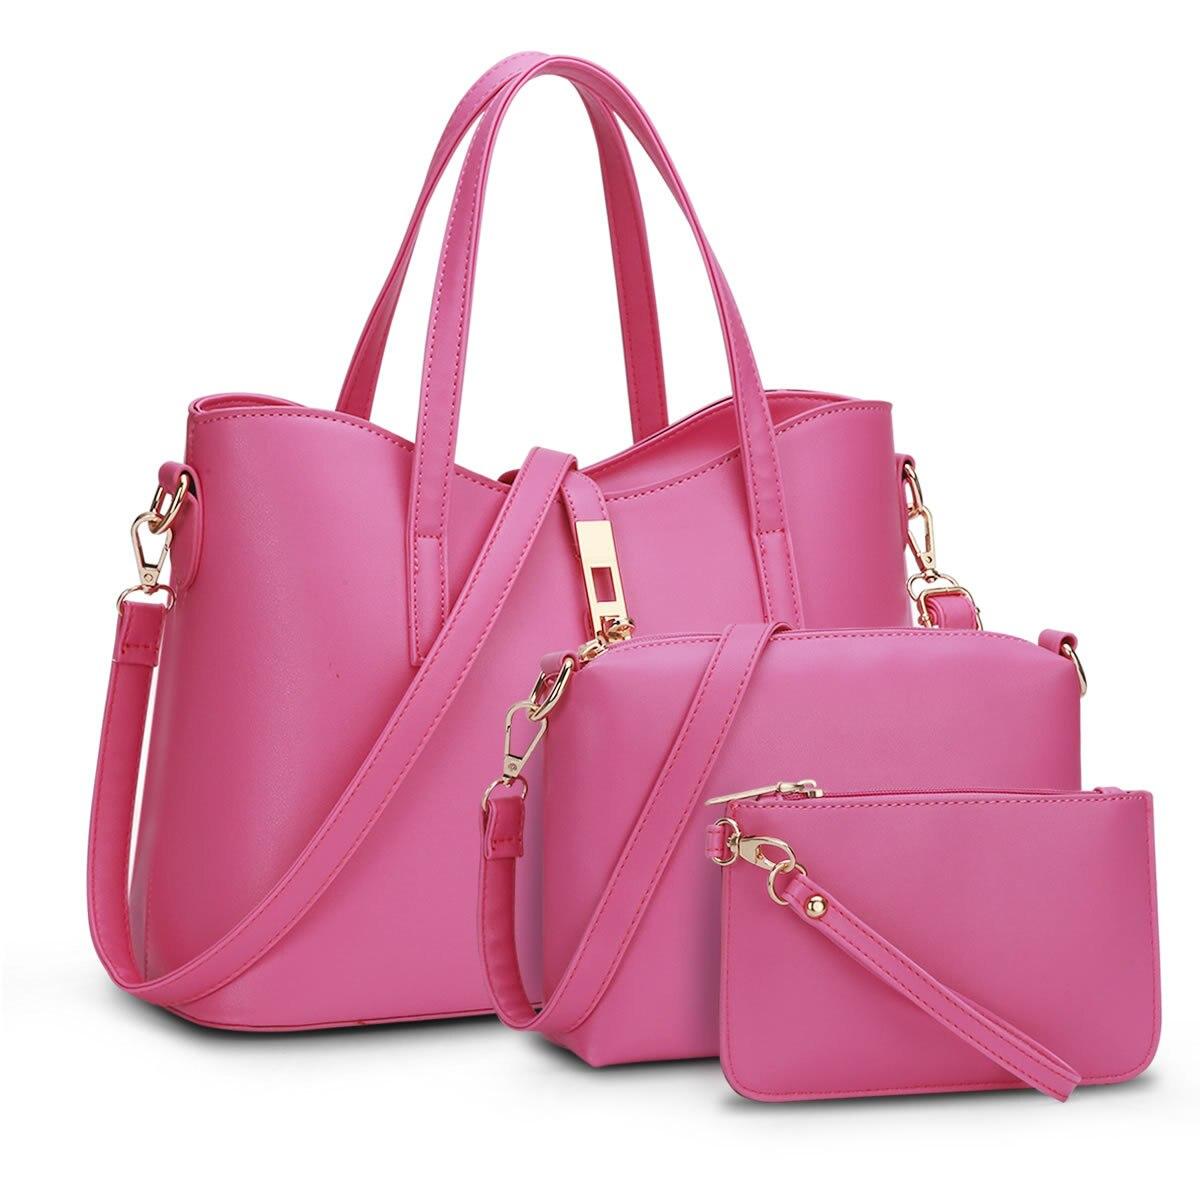 Top Fashion Lady Totes Women Pink Composite Bag Casual Handbags &amp; Crossbody Bags Polyester Handbags SMYYG-A0055<br><br>Aliexpress